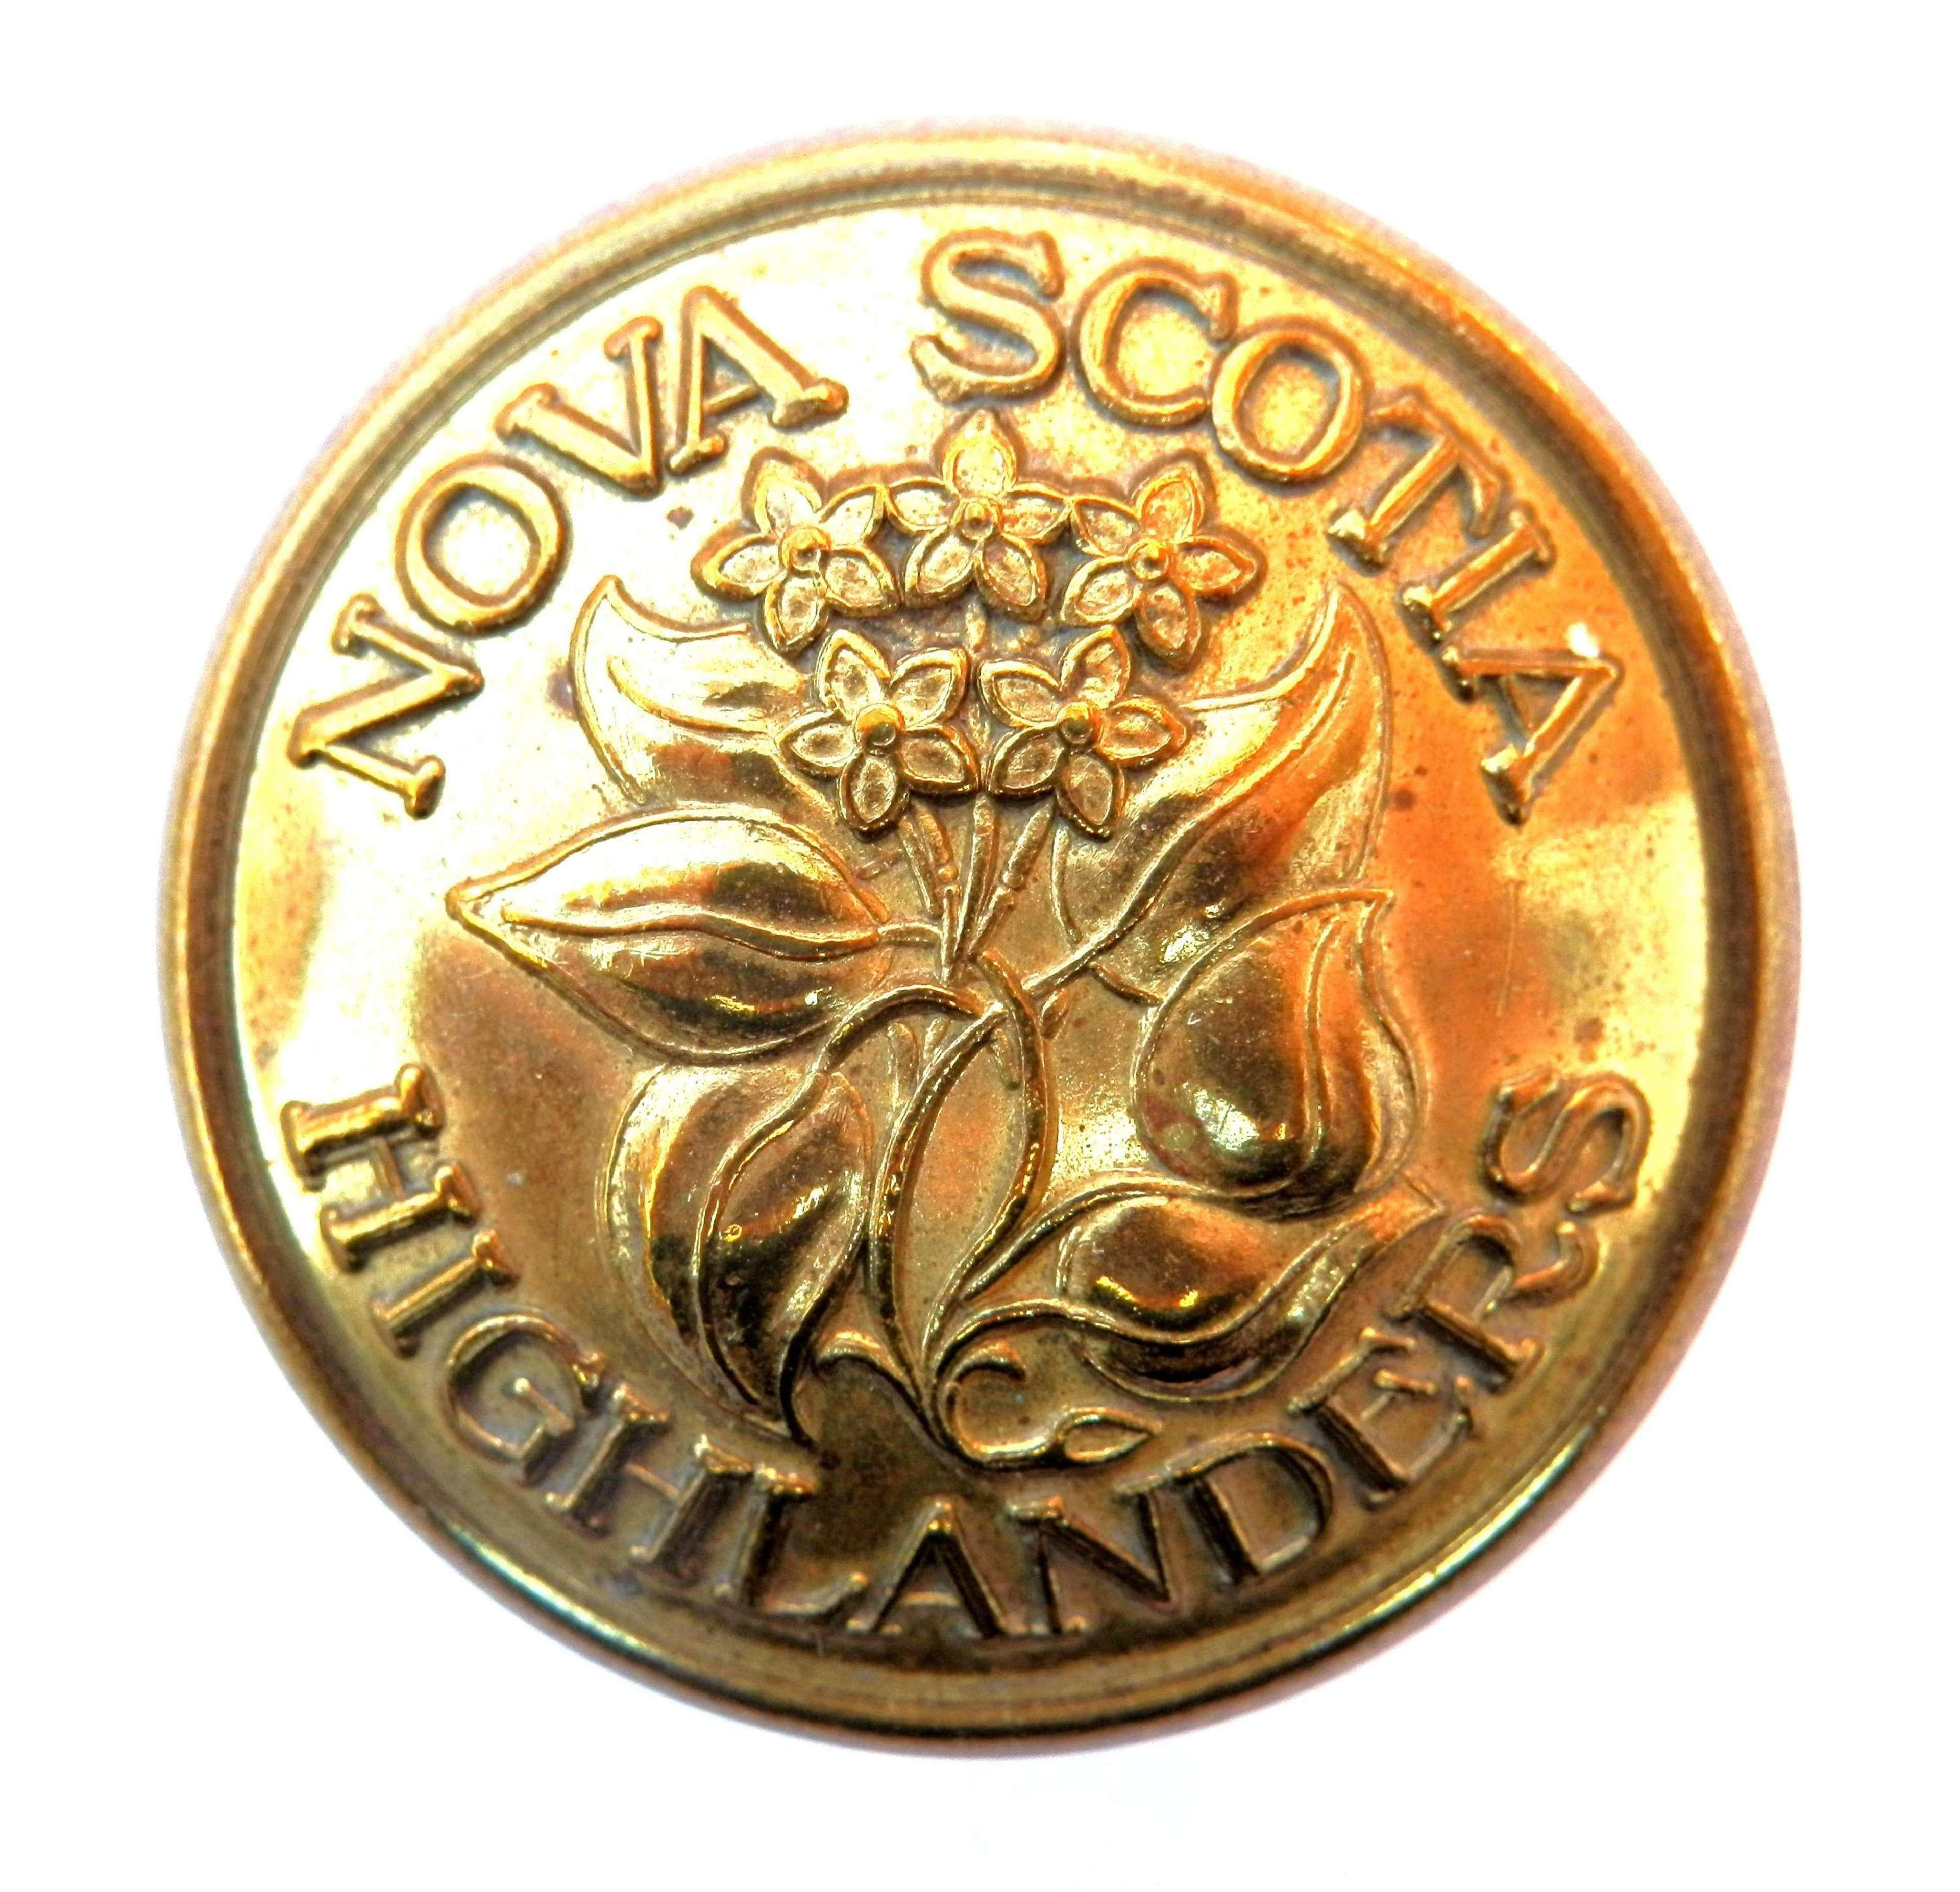 Nova Scotia Highlanders, Canadian issue Button.